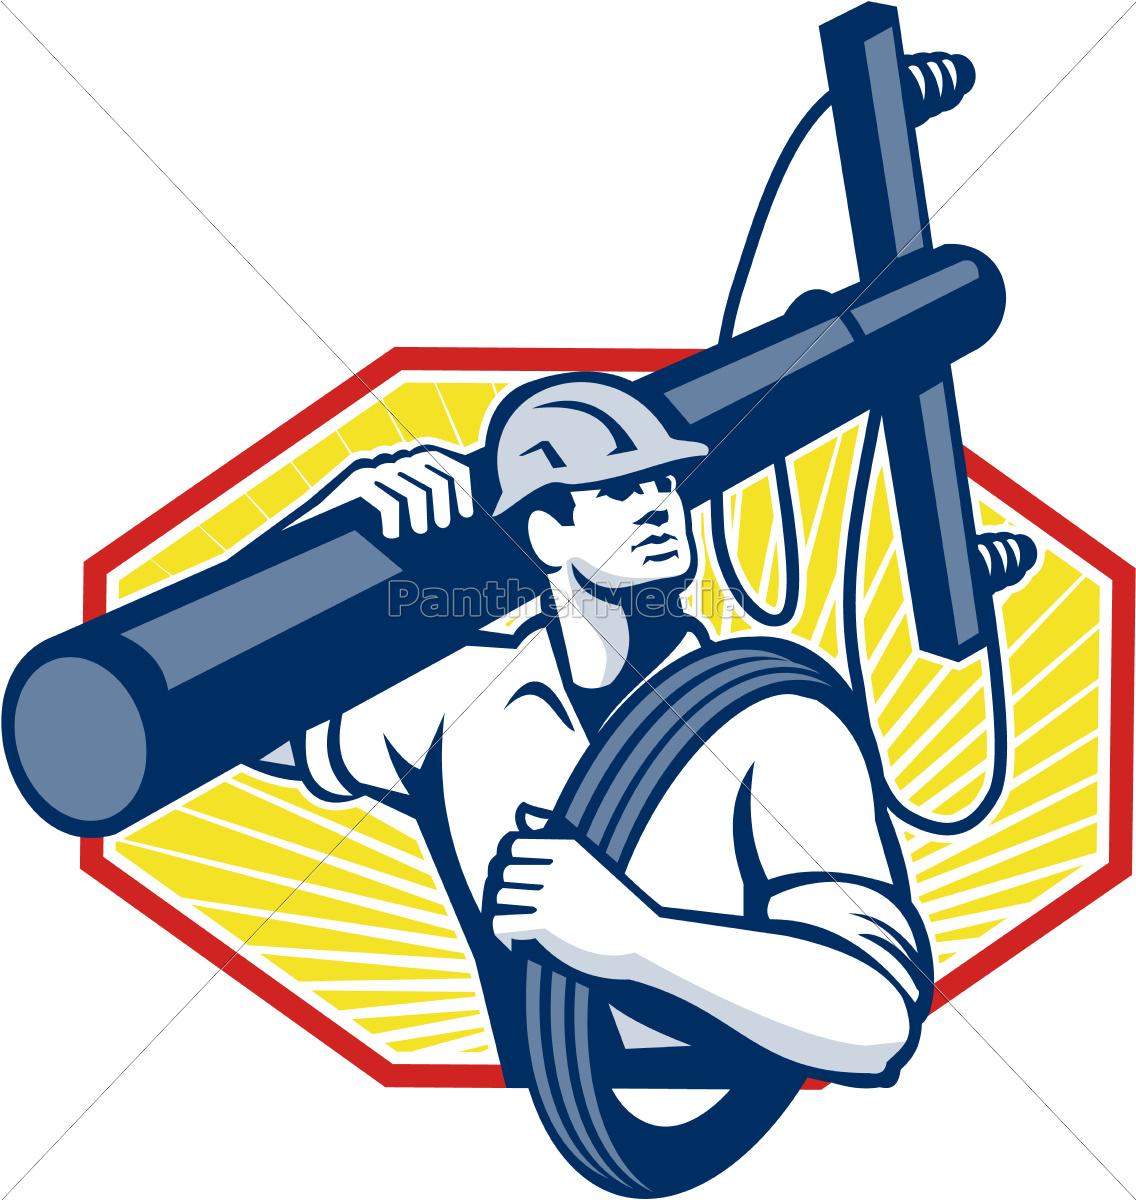 power, lineman, repairman, carry, electric, pole - 10032134